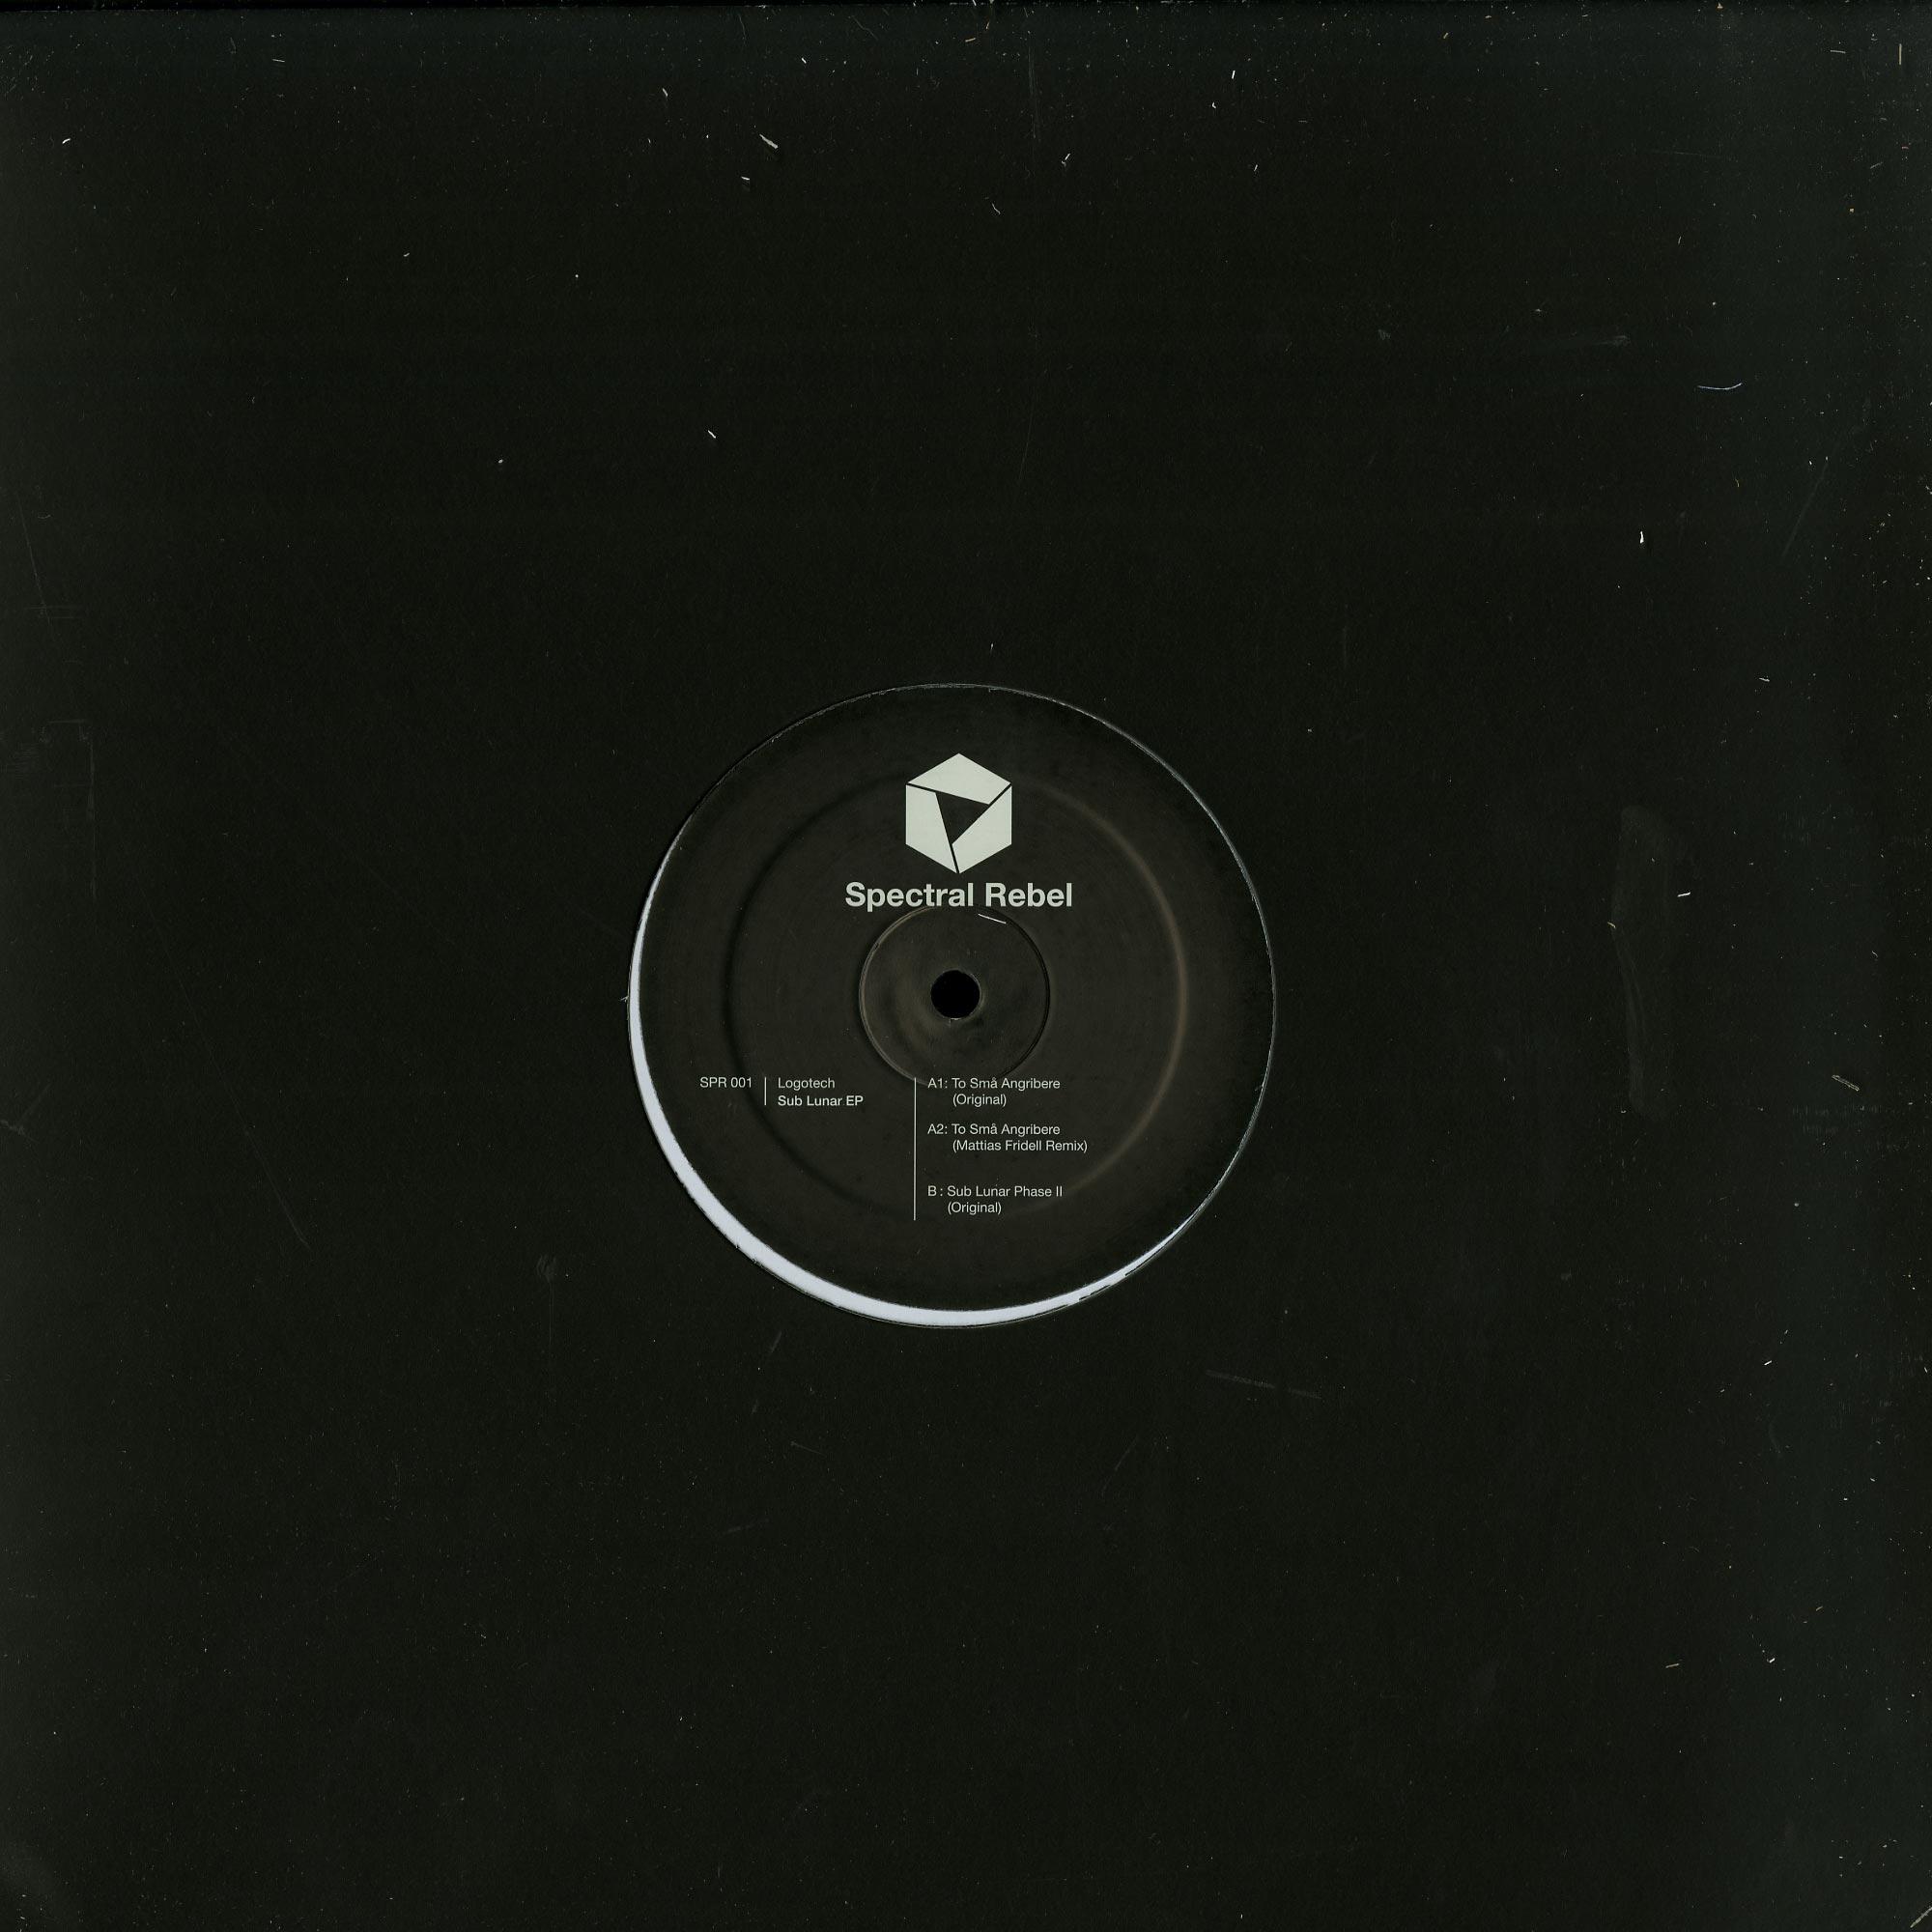 Logotech - SUB LUNAR EP